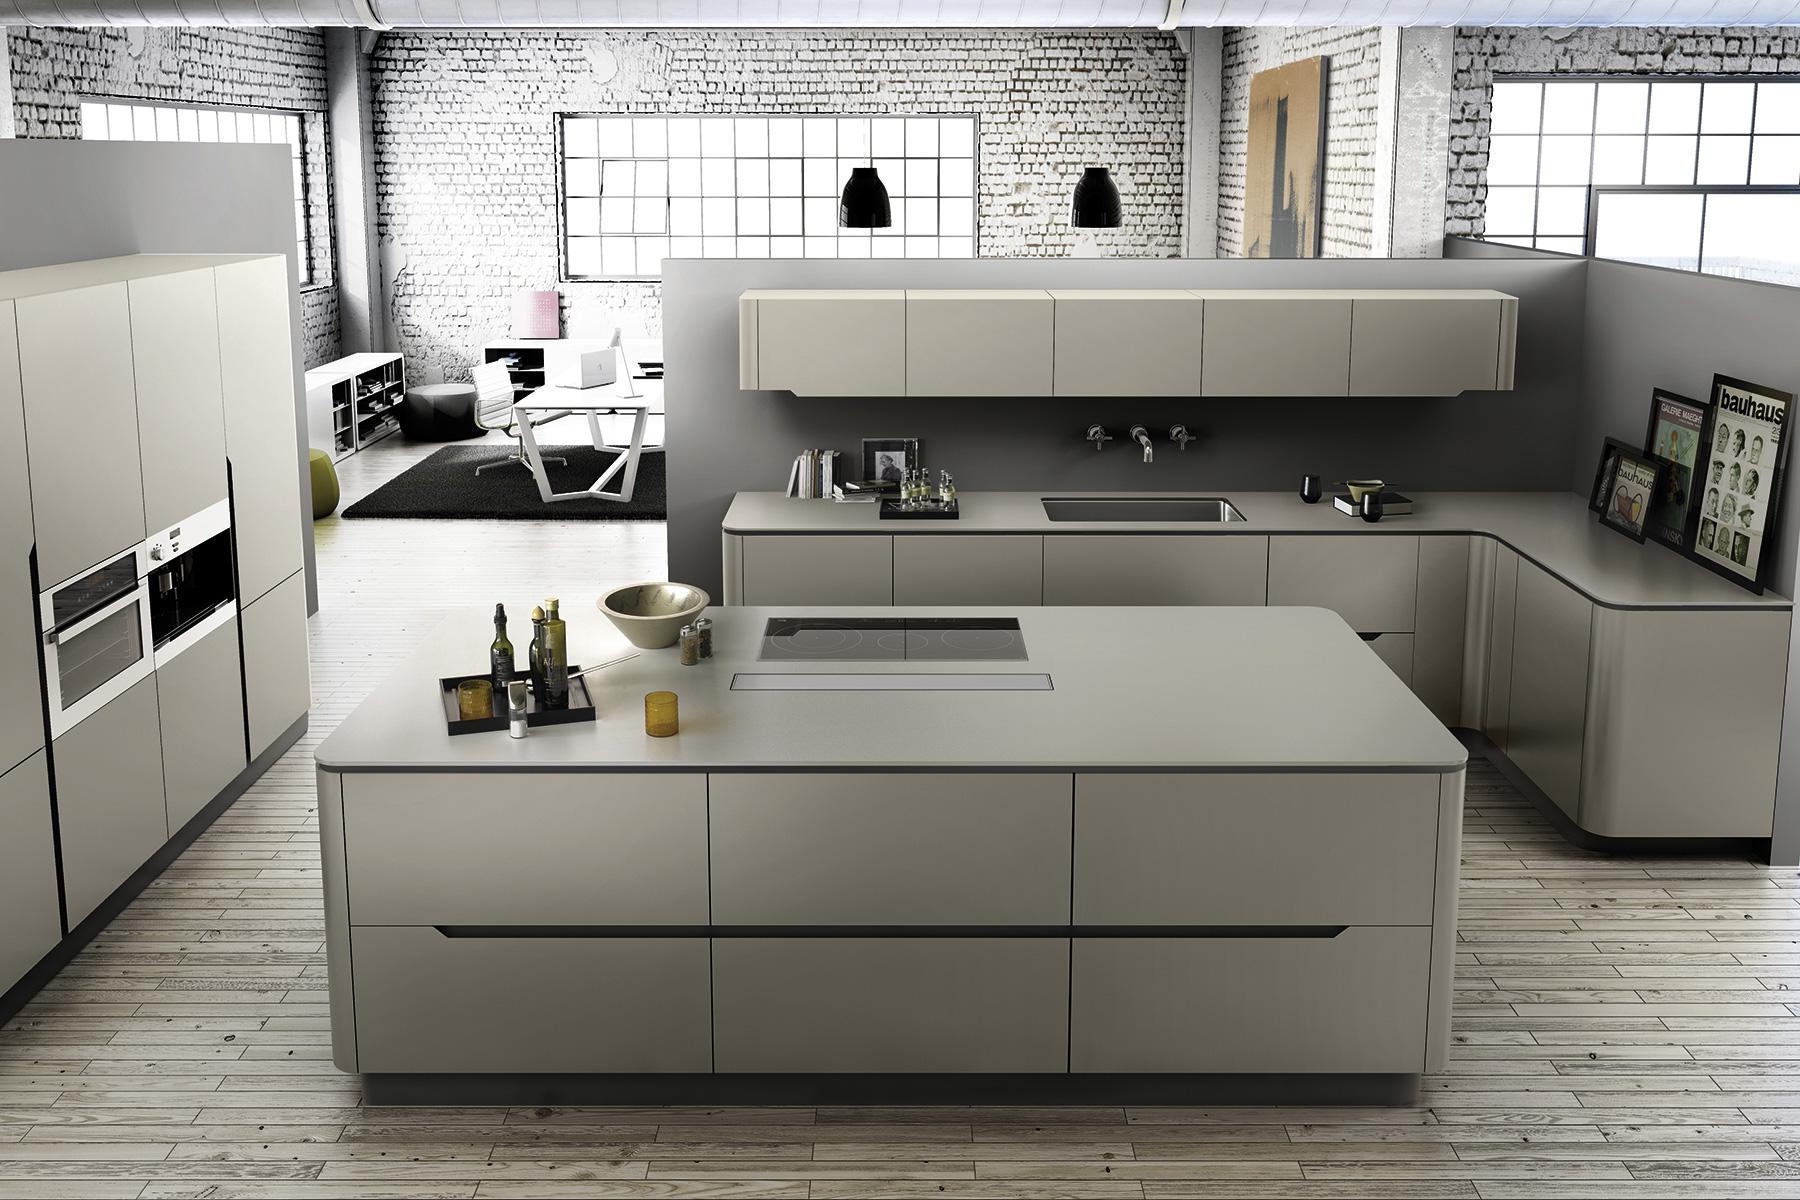 Xp Muebles De Cocina - Xp Ideas Cocinas Mobiliario De Cocina En M Laga Muebles De [mjhdah]http://www.logoscoop.com/documentos/produc/interior1/41.jpg